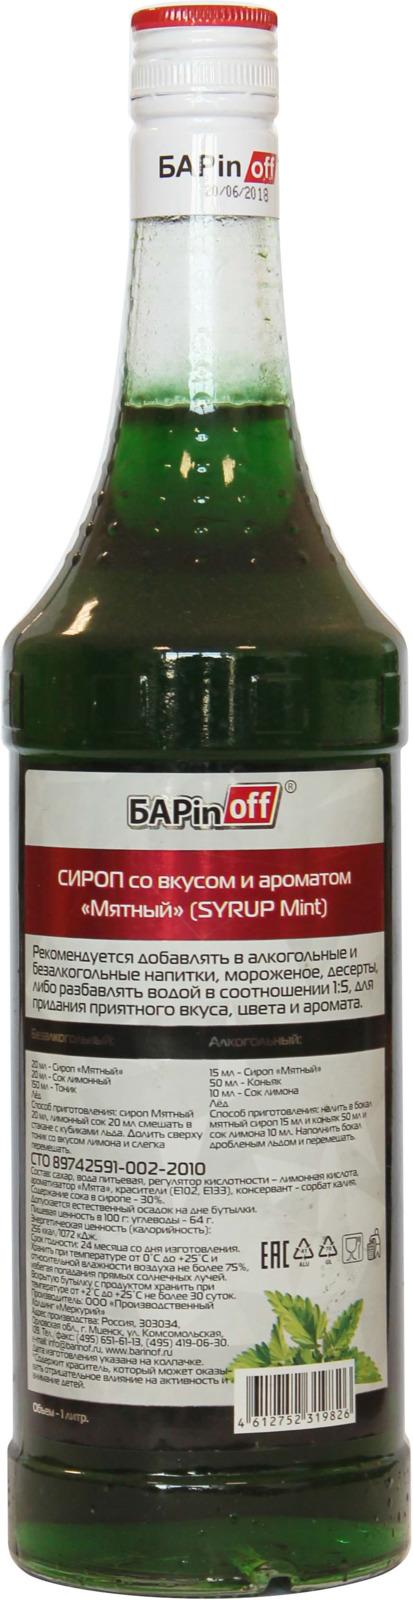 BarinoffСироп Мятный, 1 л Barinoff